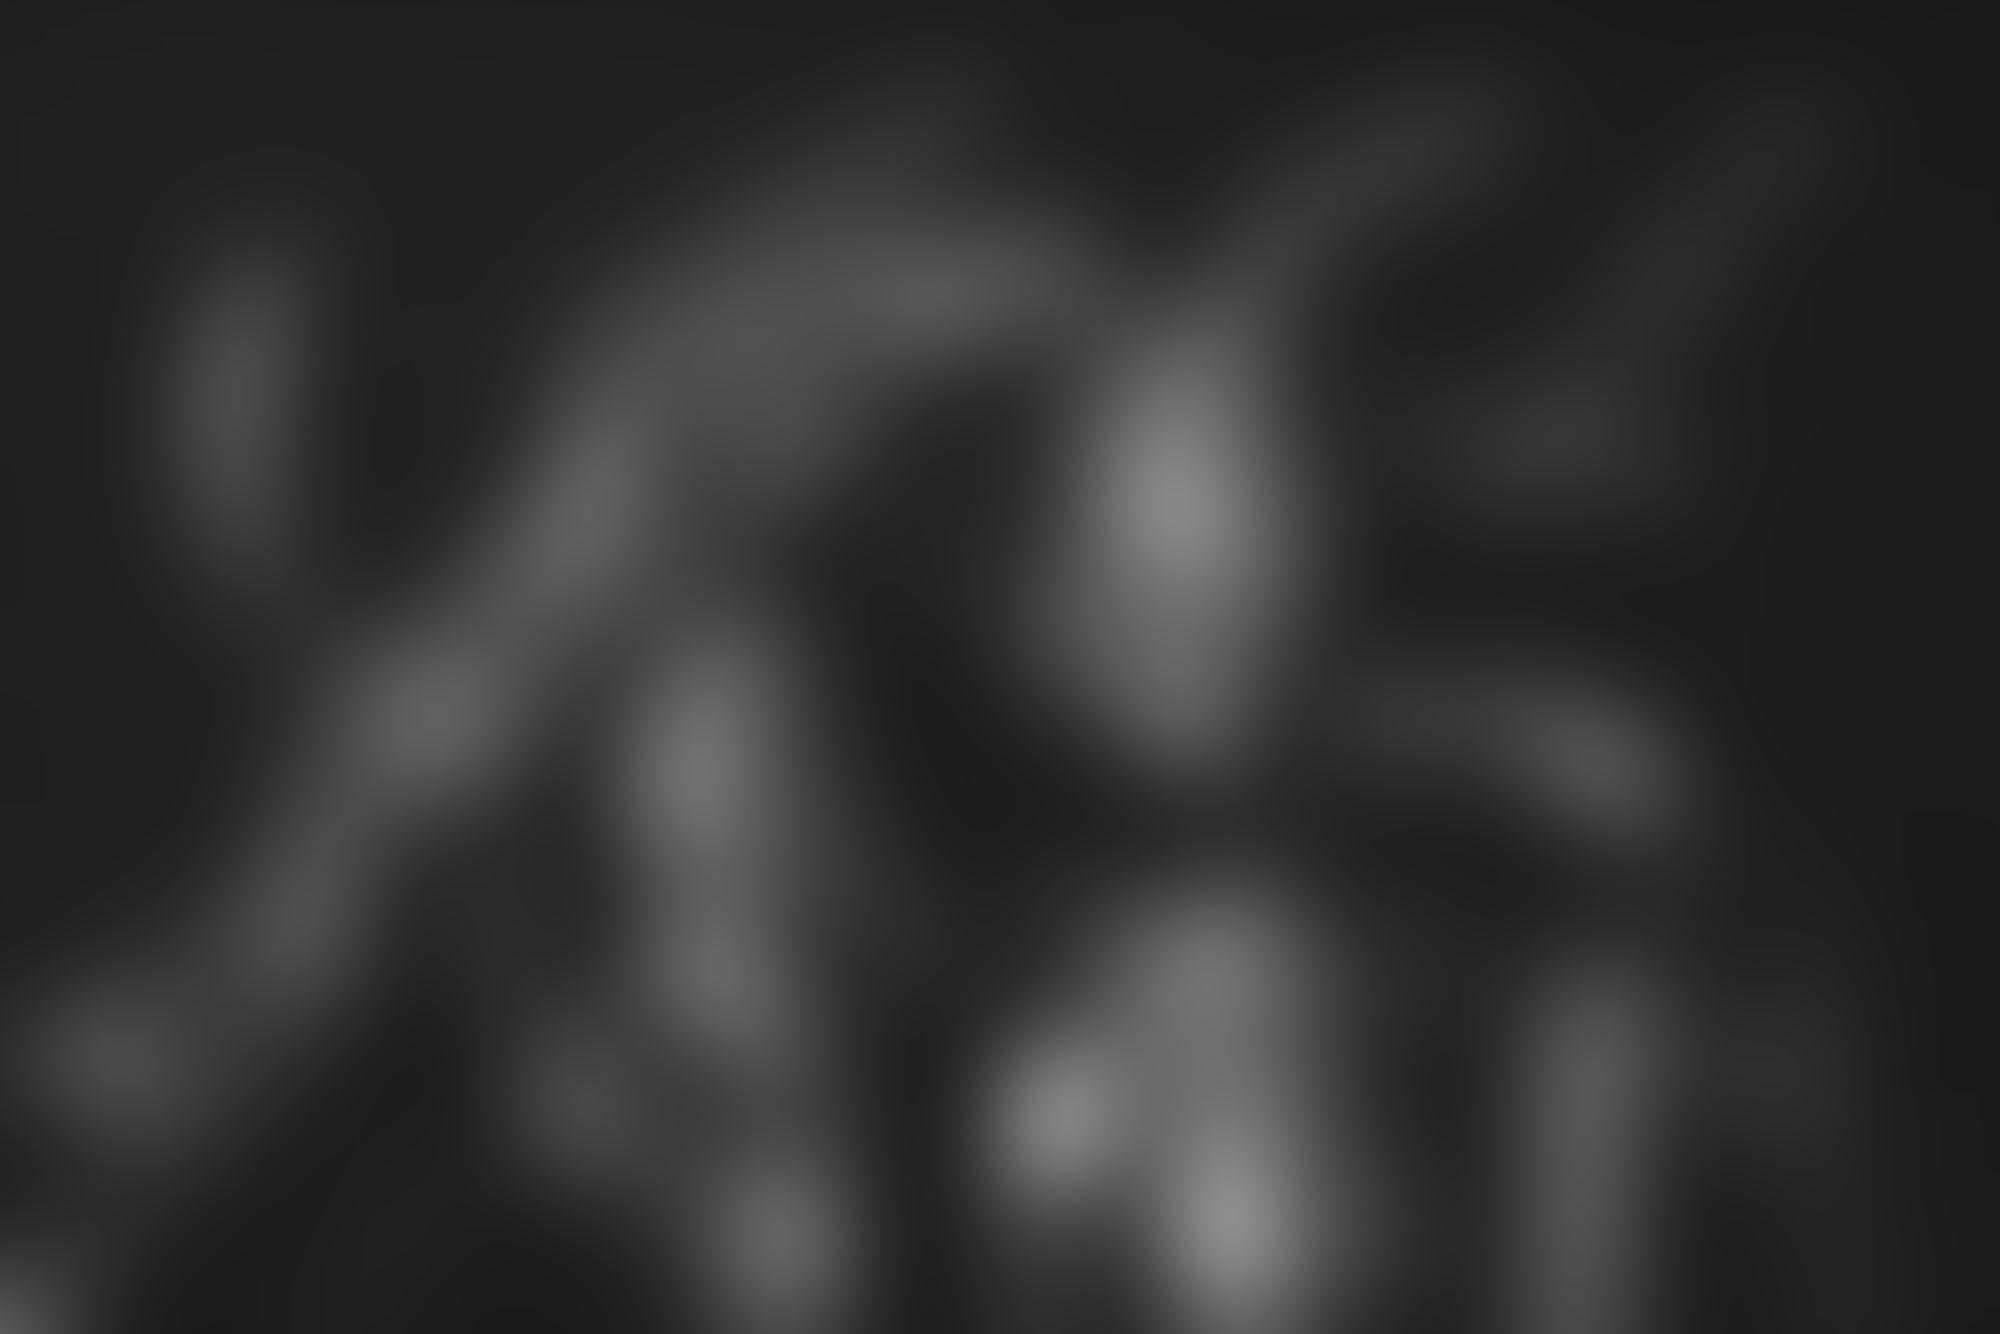 Snapchat Exercises Poor Judgment With 4/20 Bob Marley Blackface Filter